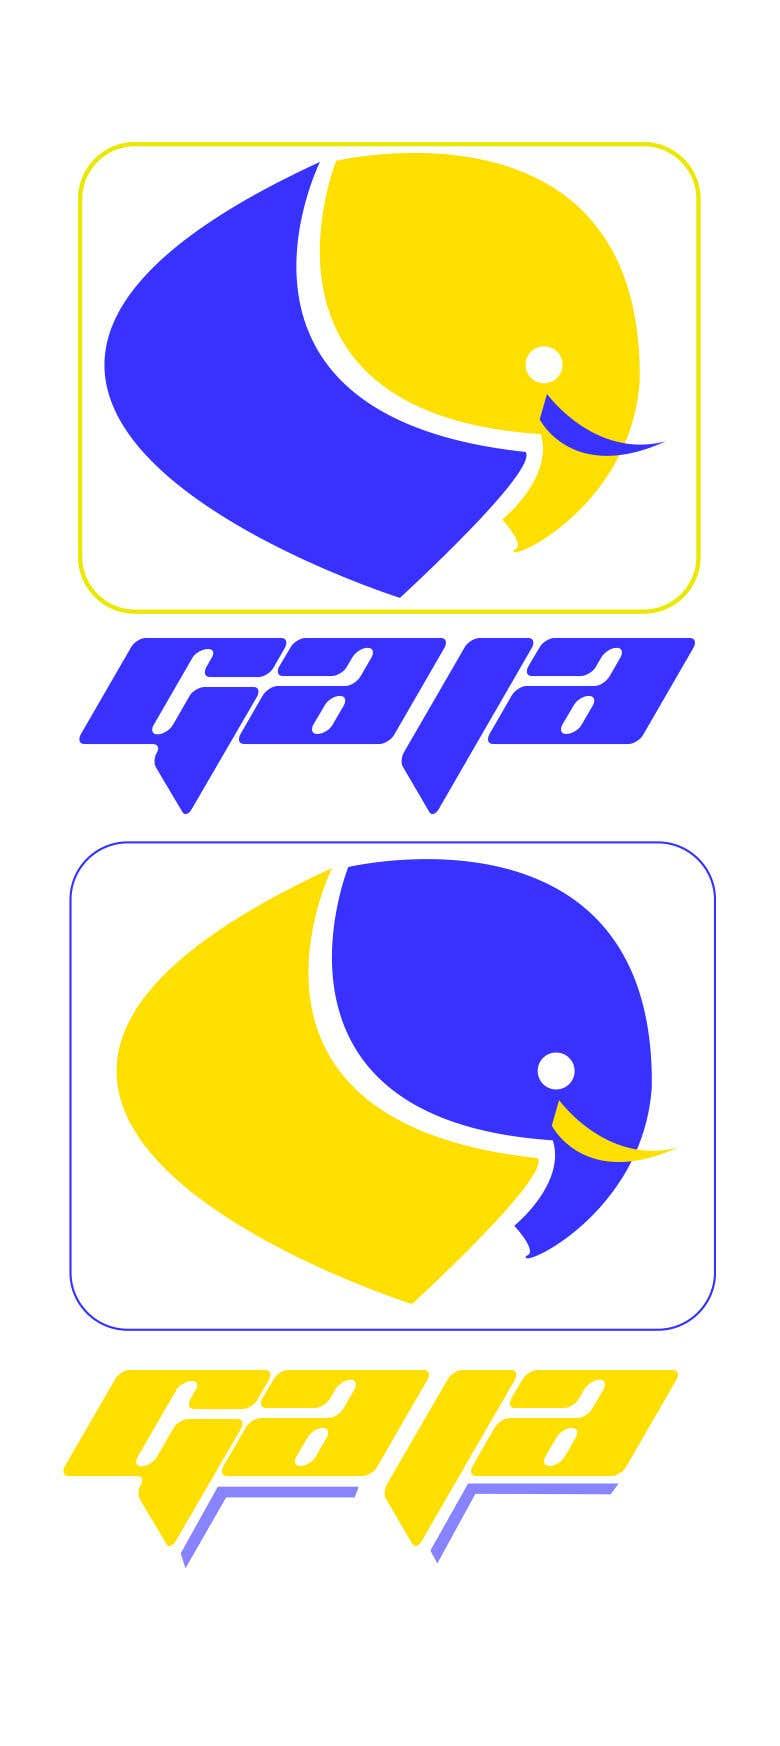 Konkurrenceindlæg #439 for I need an Indian logo designer to do my Indian logo